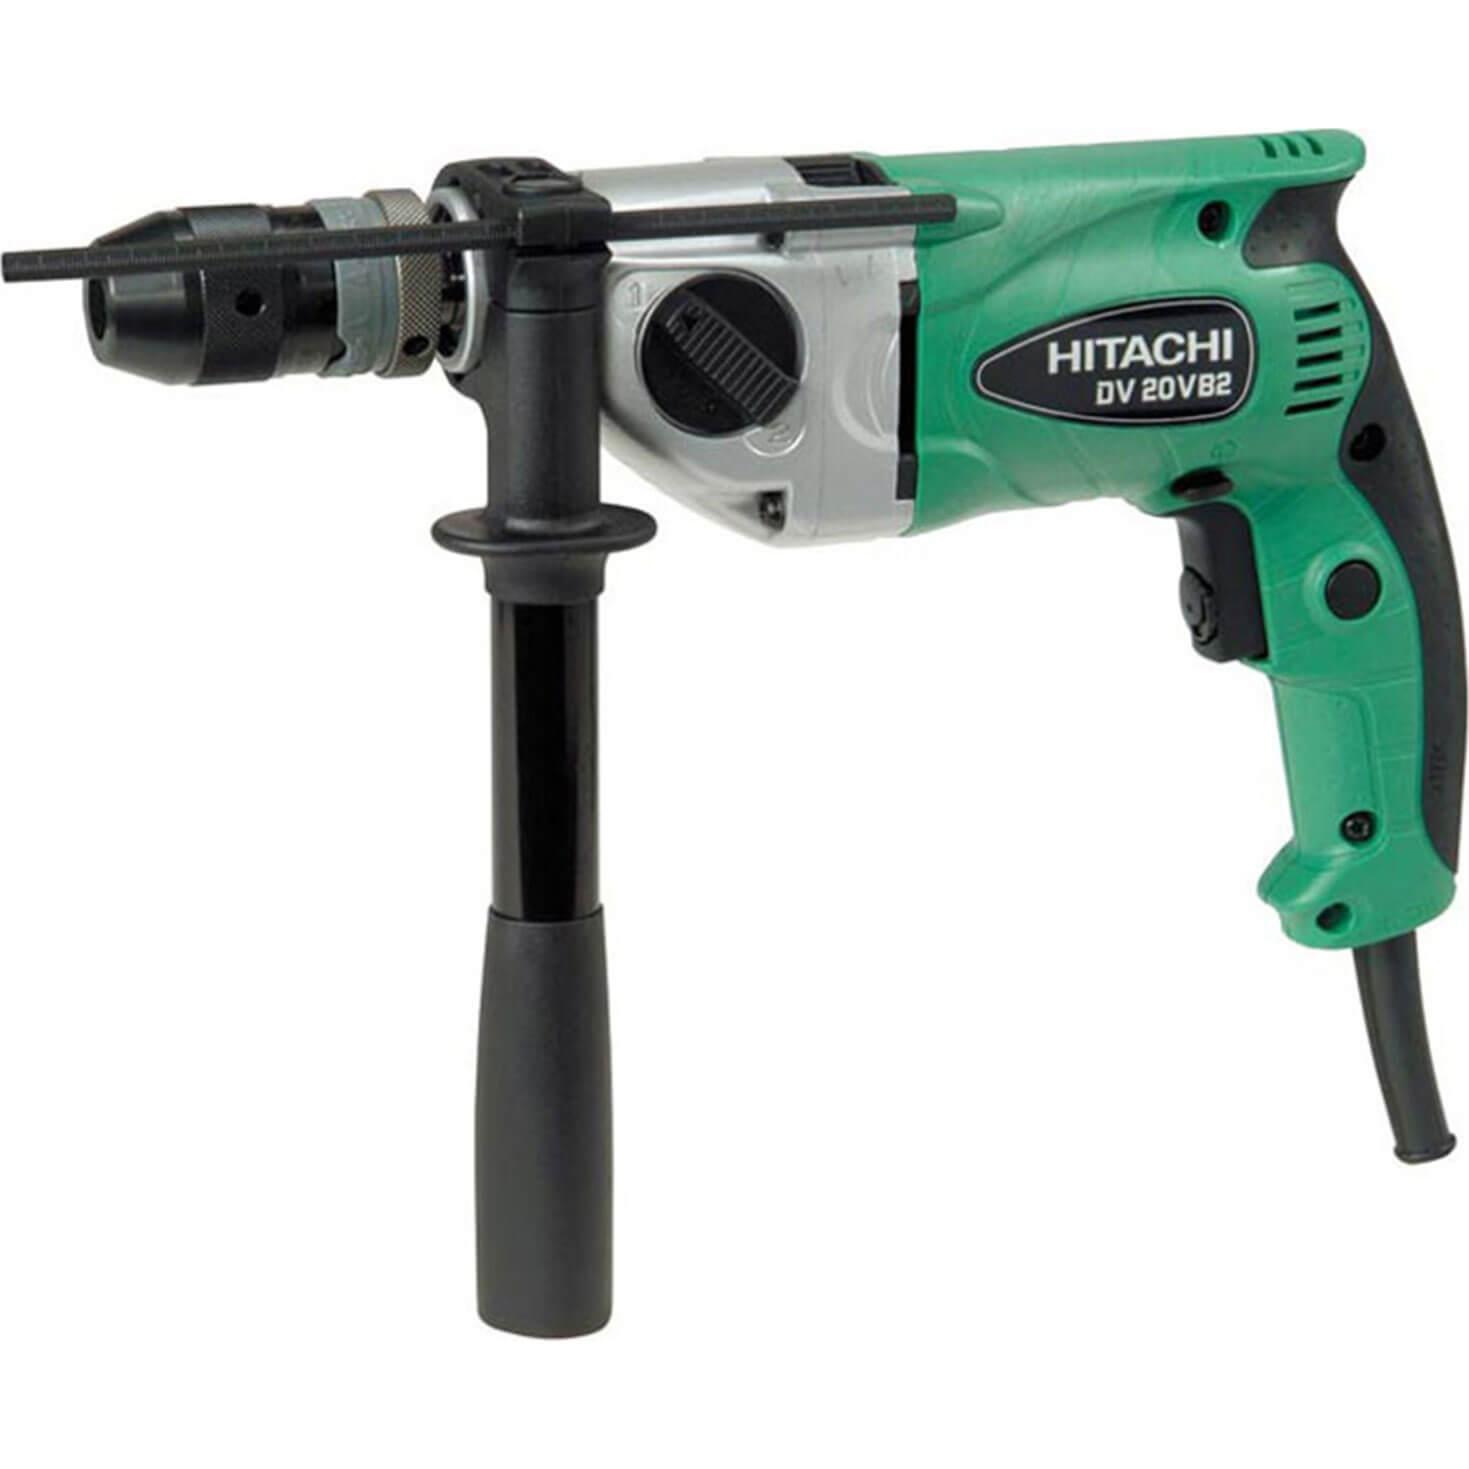 Hitachi Dv20vb2 Hammer Drill 790w 240v